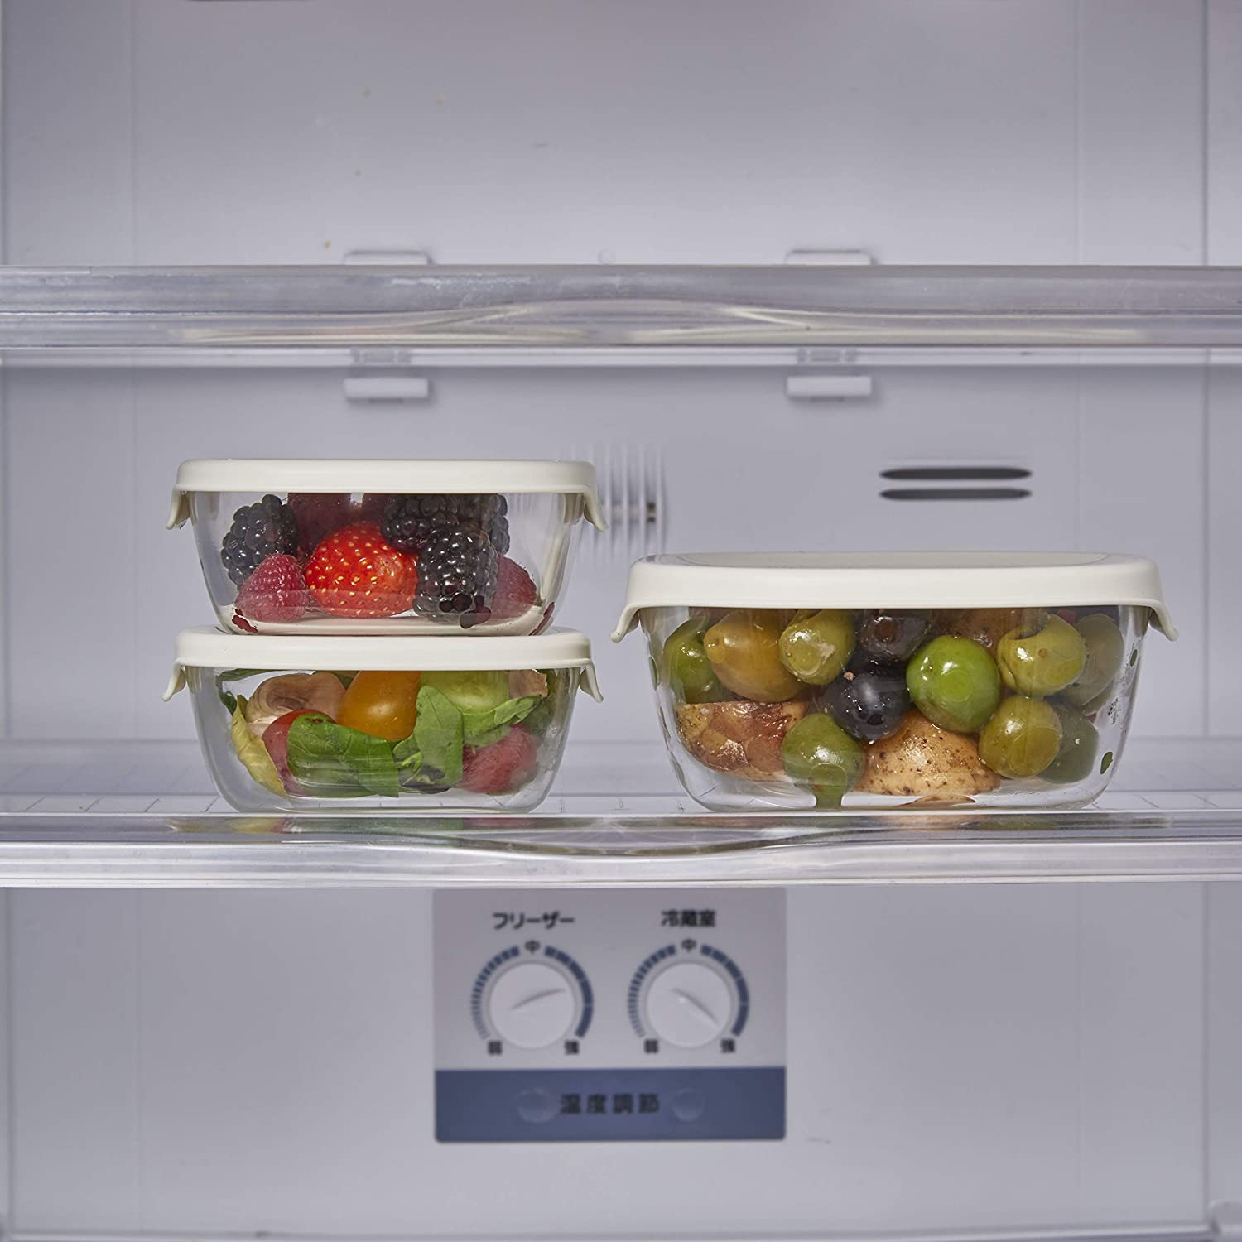 HARIO(ハリオ) 耐熱ガラス製保存容器セット 8個入り KST-5604-OWの商品画像6